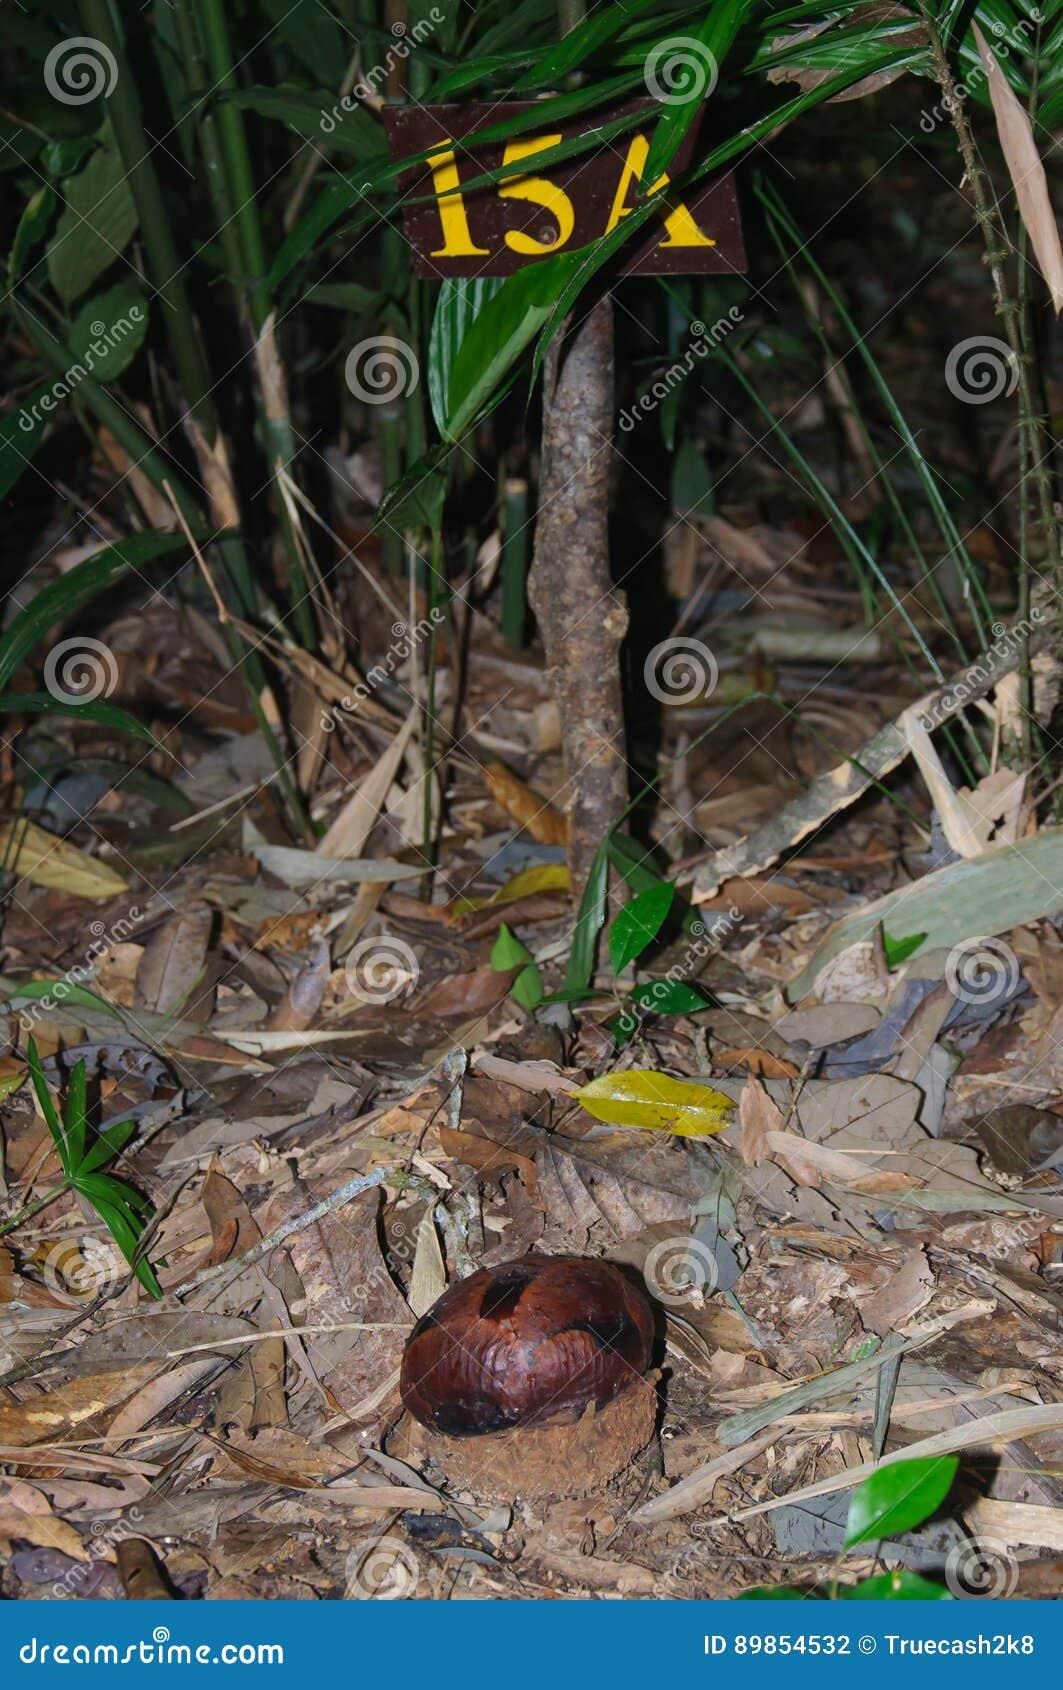 Round Rafflesia bud in floor of tropical forest, Khao Sok, Thailand